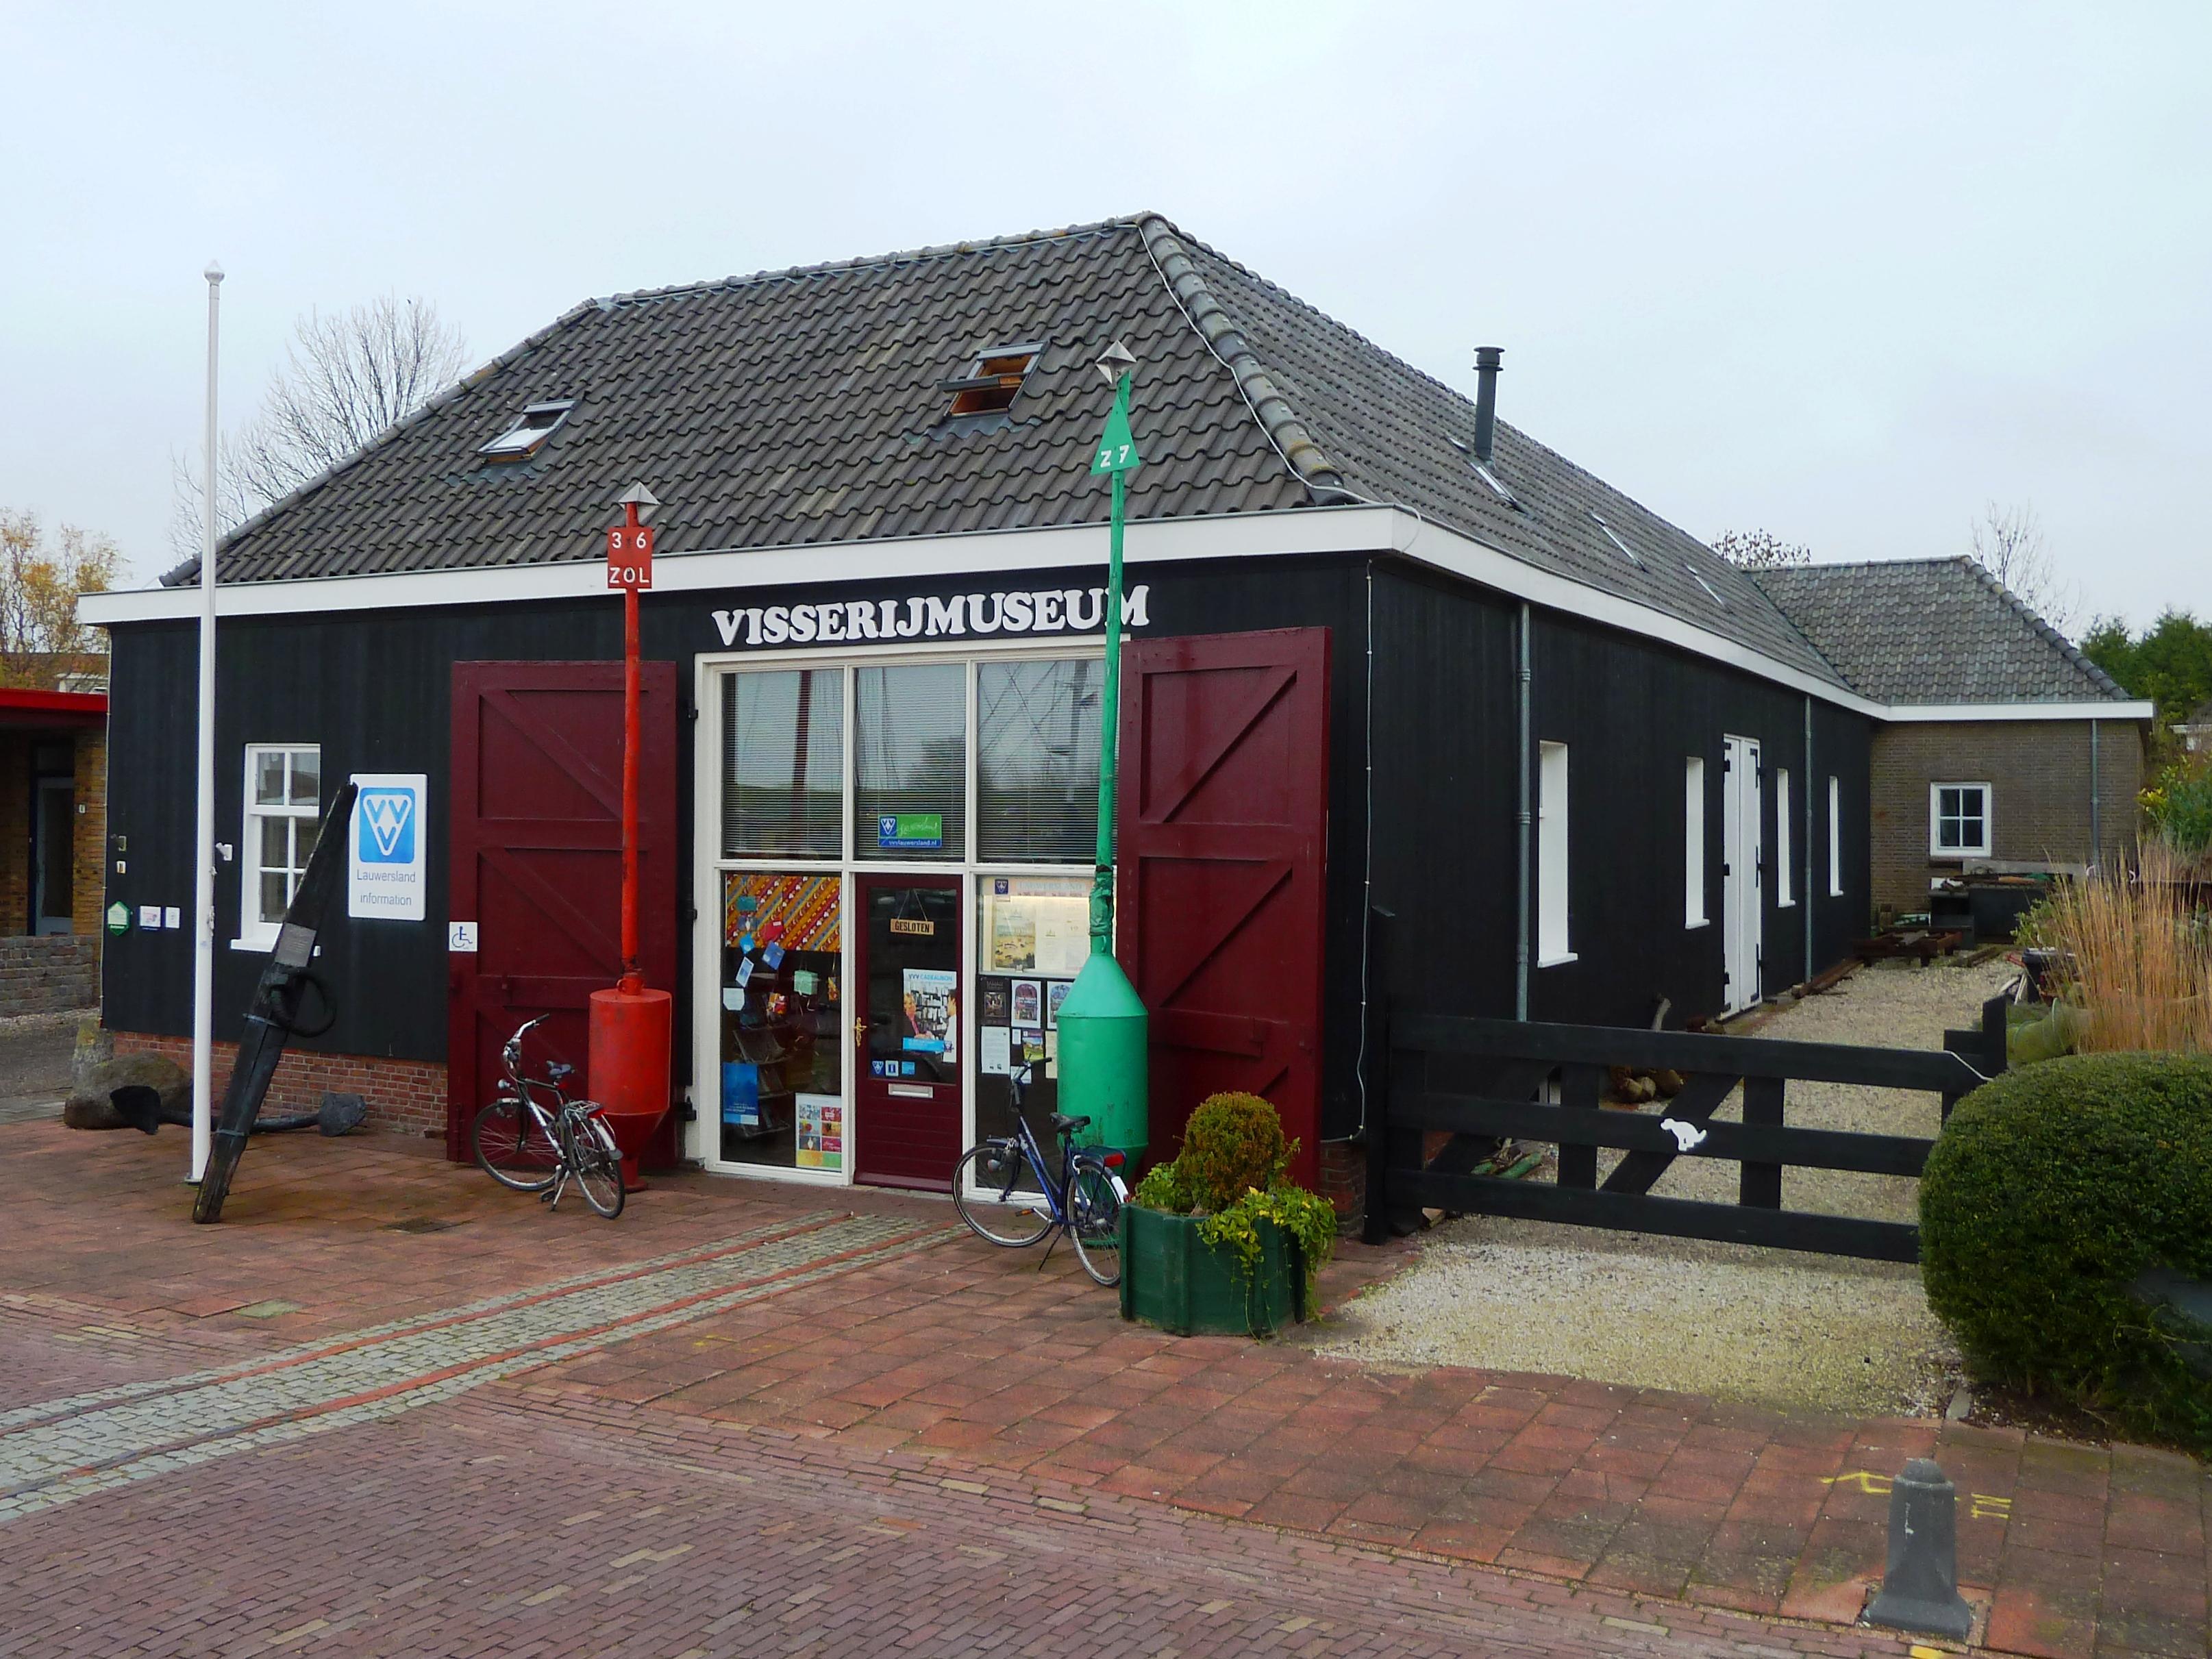 Rotterdam Vvv Kantoor : Loods van de rijksbetonningsdienst vvv kantoor museum in